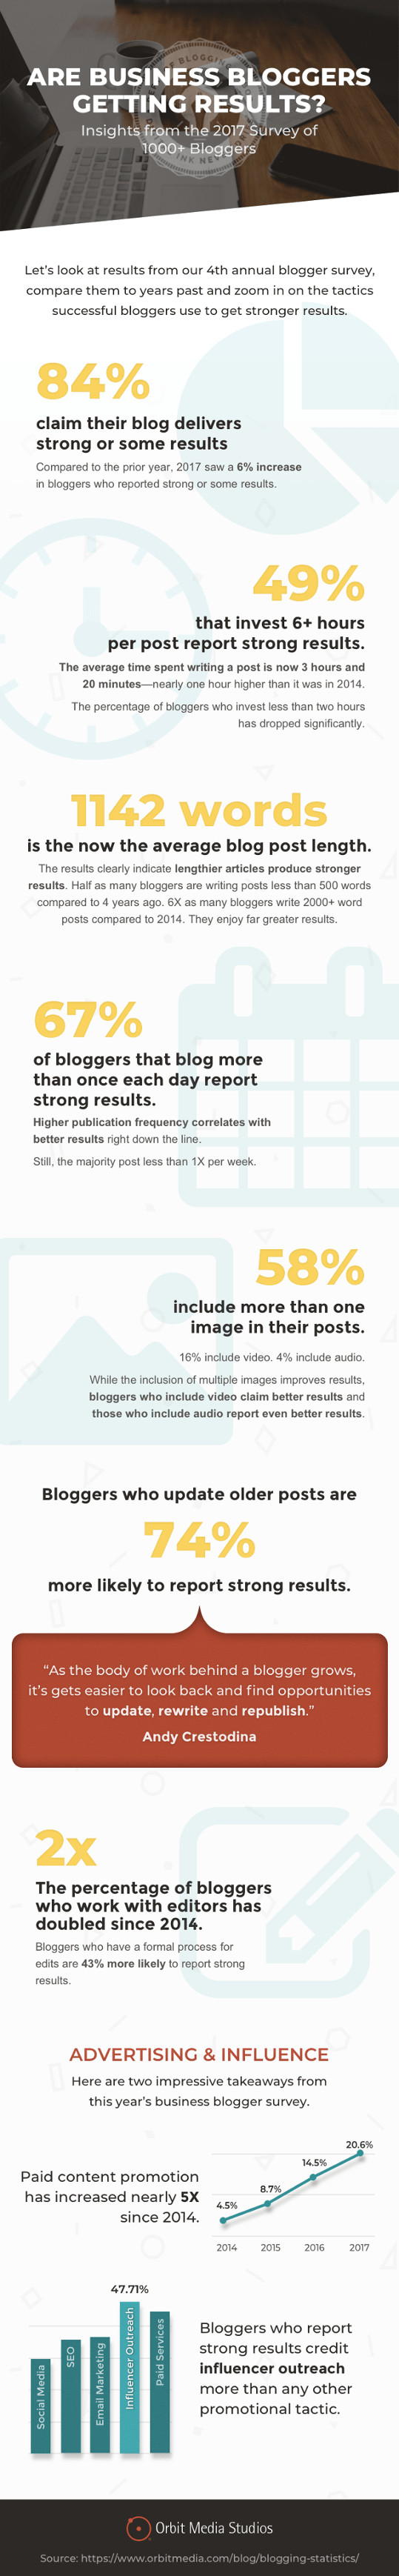 blogger survey infographic-min.png